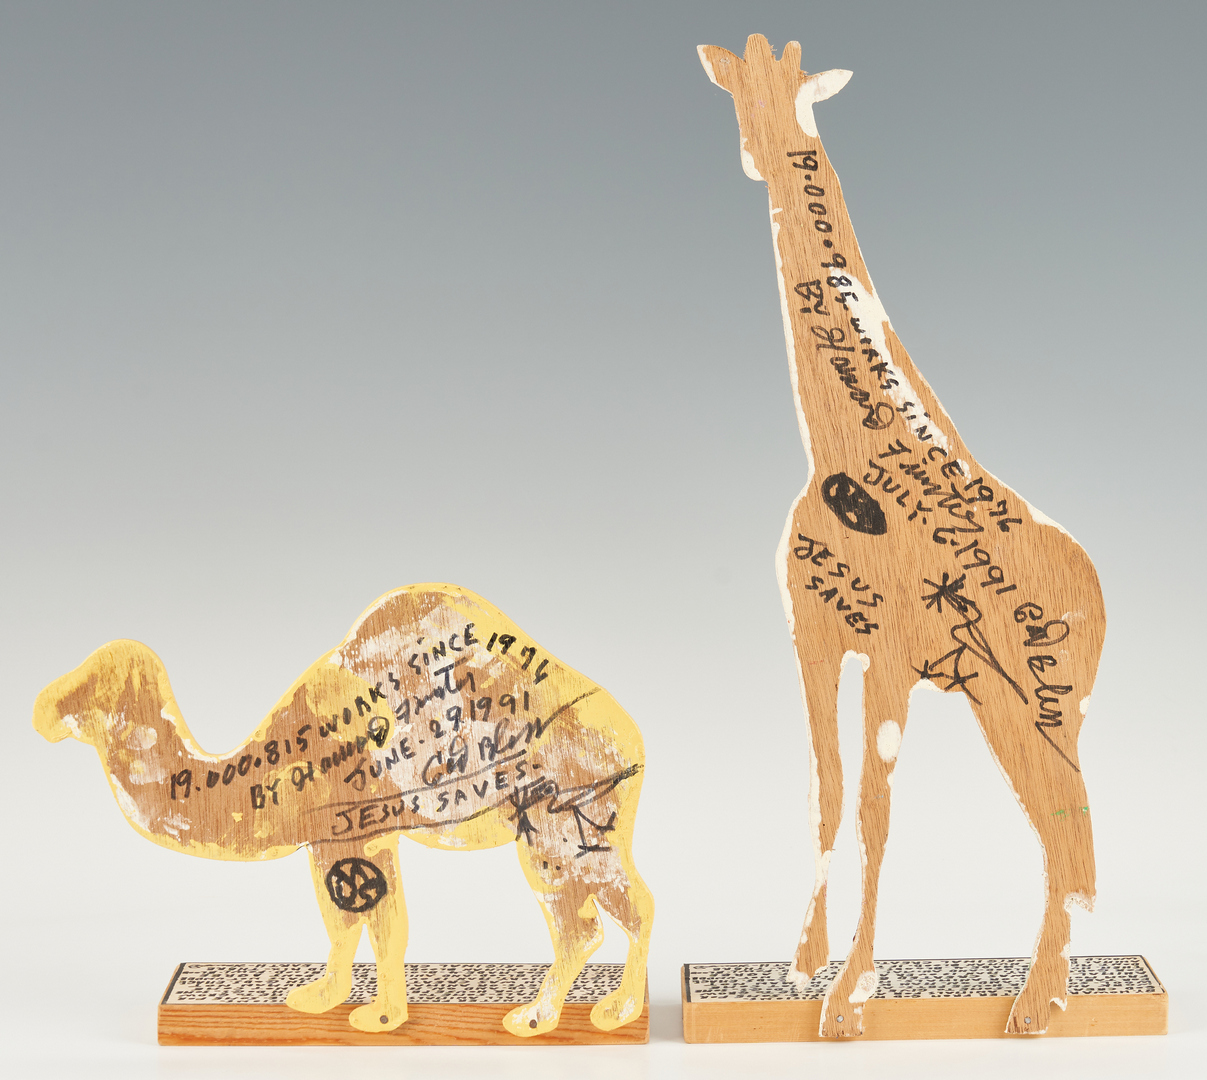 Lot 154: Howard Finster Folk Art Camel & Giraffe Bookends